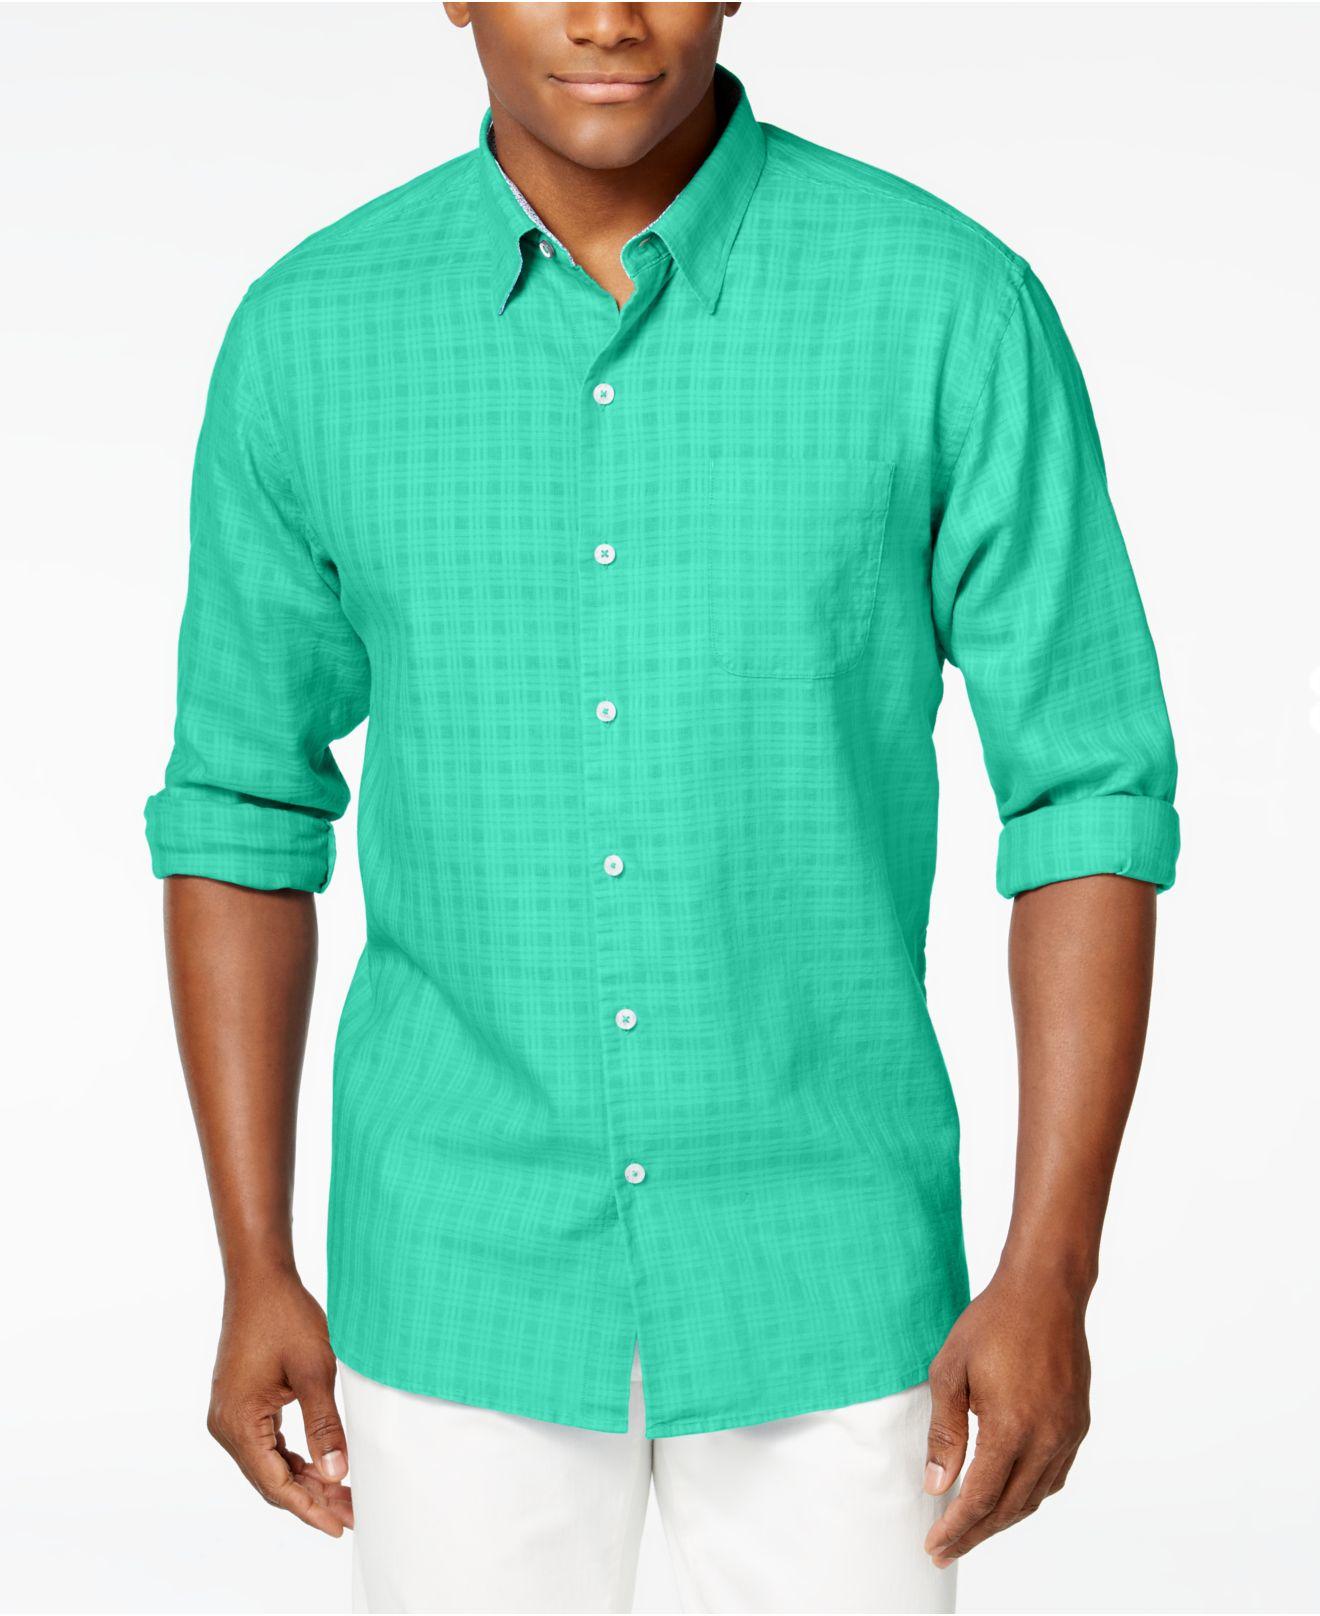 Lyst tommy bahama men 39 s sydney squares long sleeve shirt for Tommy bahama long sleeve dress shirts